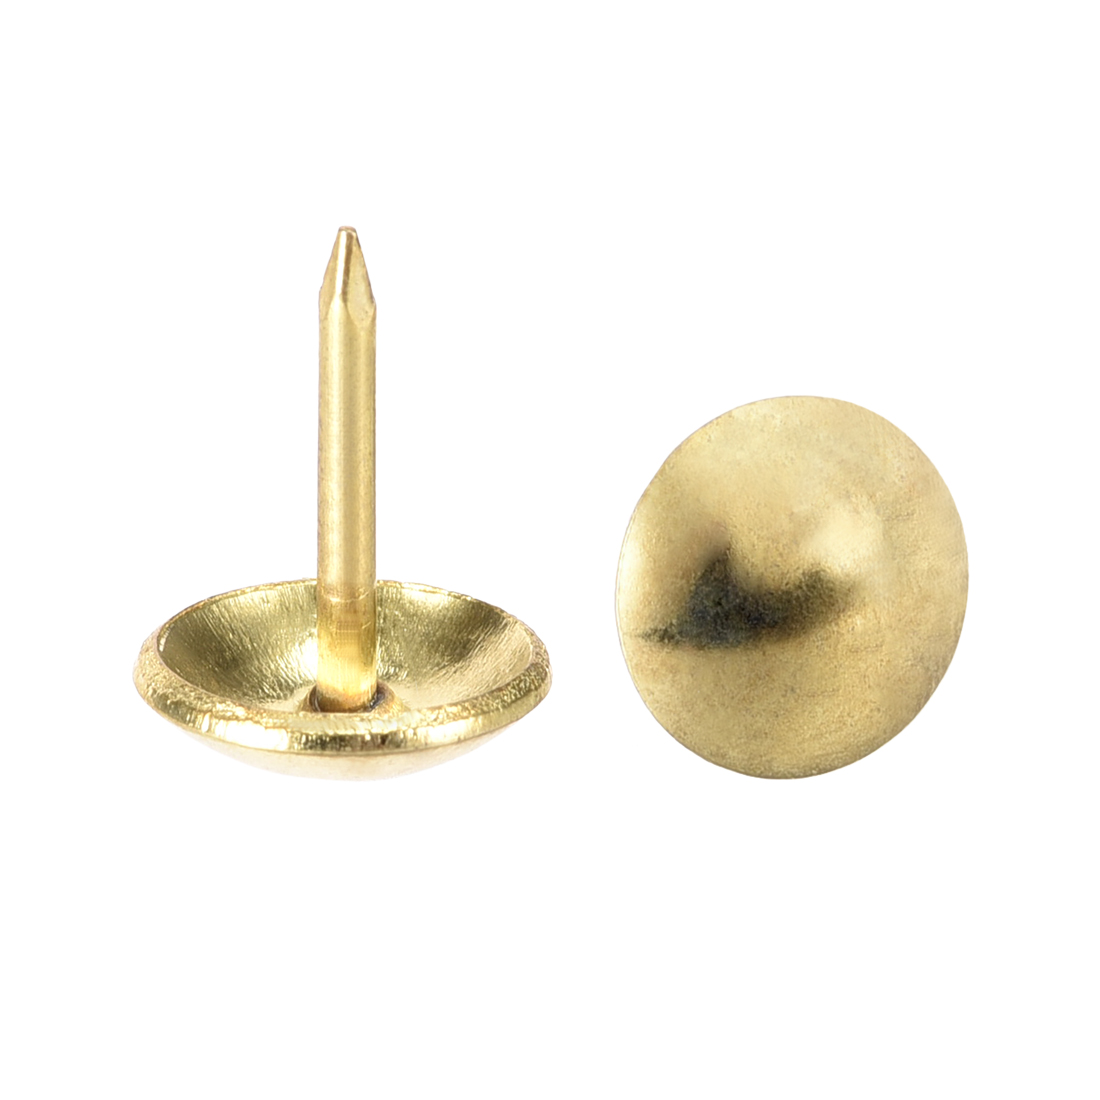 Upholstery Nails Tacks 10mm Dia 11mm Height Round Push Pins Gold Tone 30 Pcs